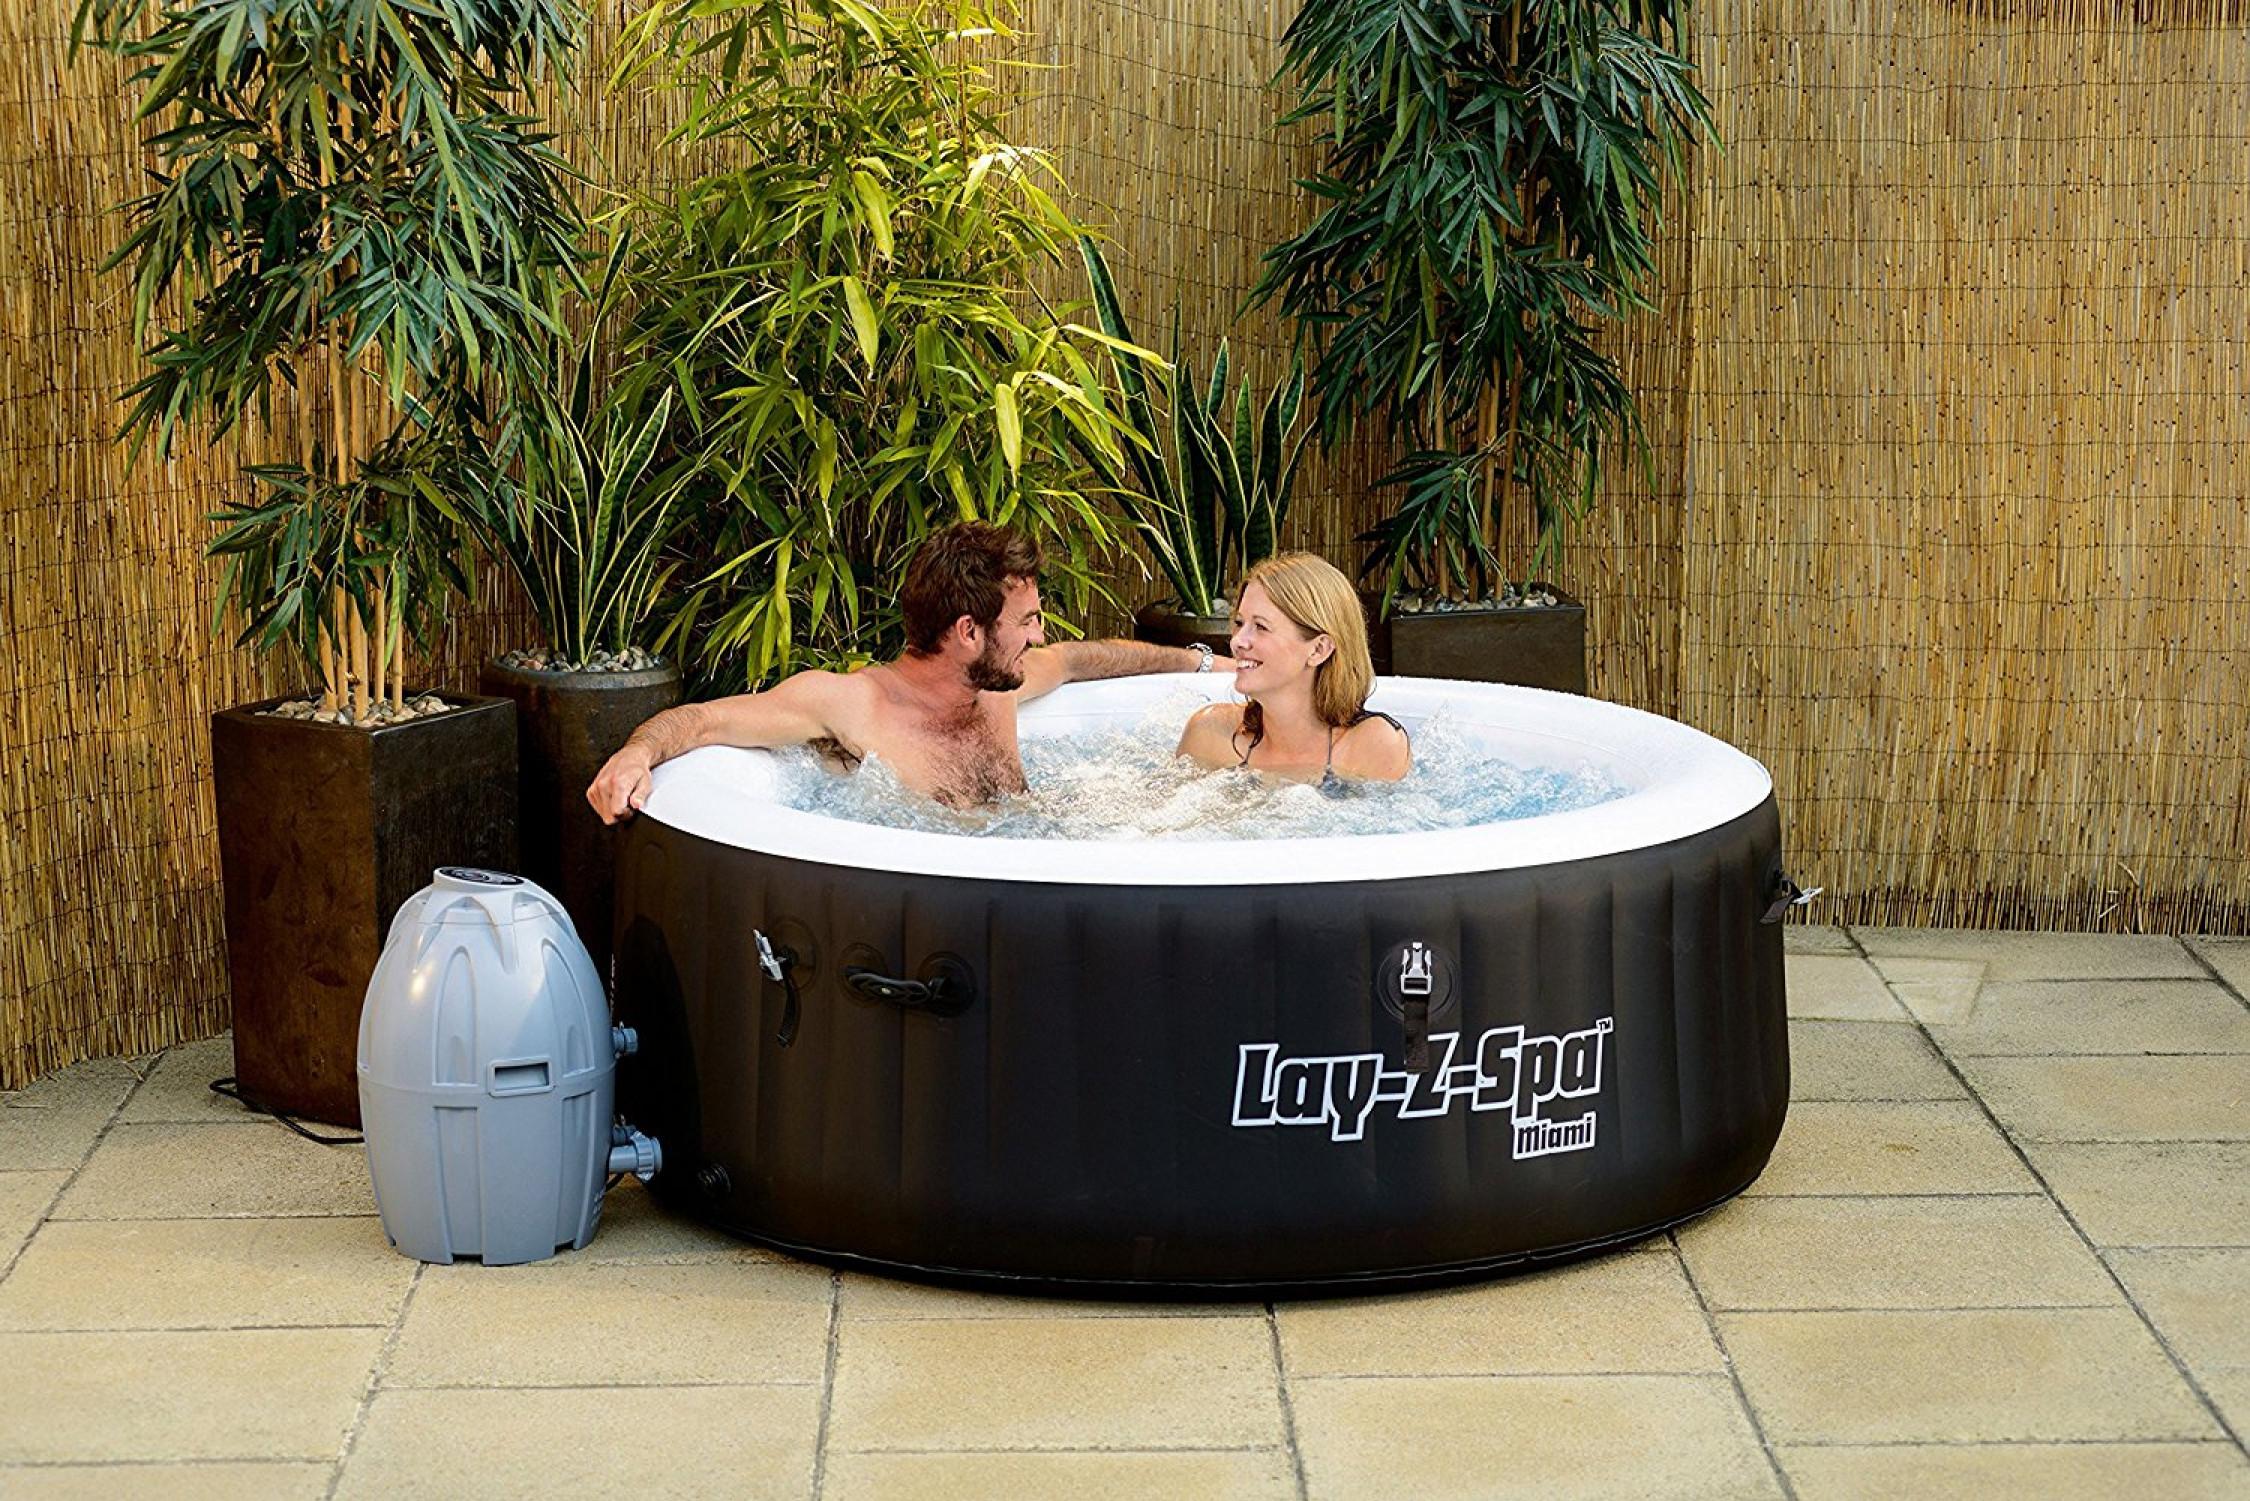 spa inflatable tub hot jacuzzi portable bath massage spa outdoor 2 4 person ebay. Black Bedroom Furniture Sets. Home Design Ideas